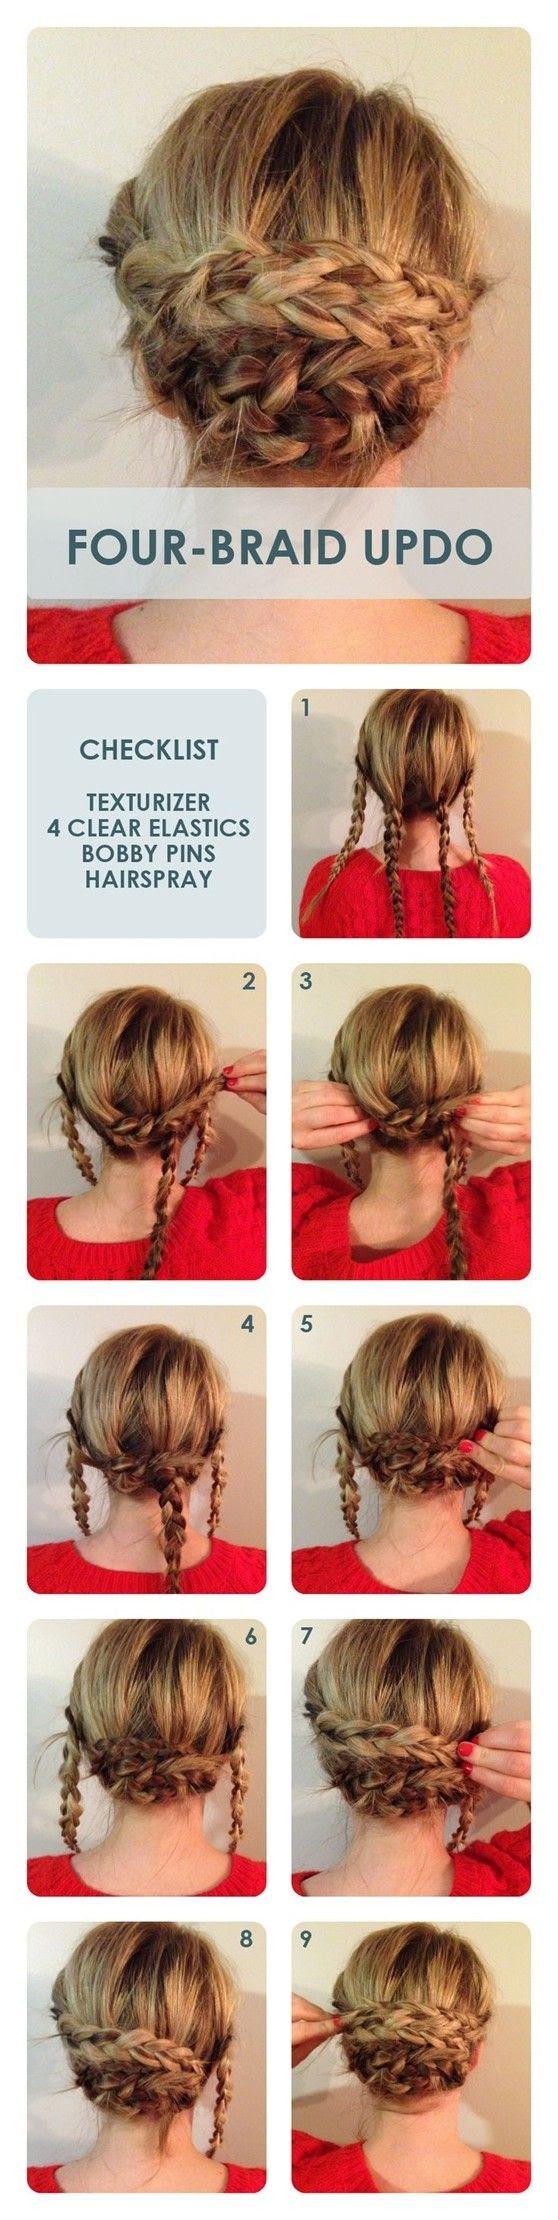 15 Braided Bun Hair Tutorials for DIY Projects - Pretty ...